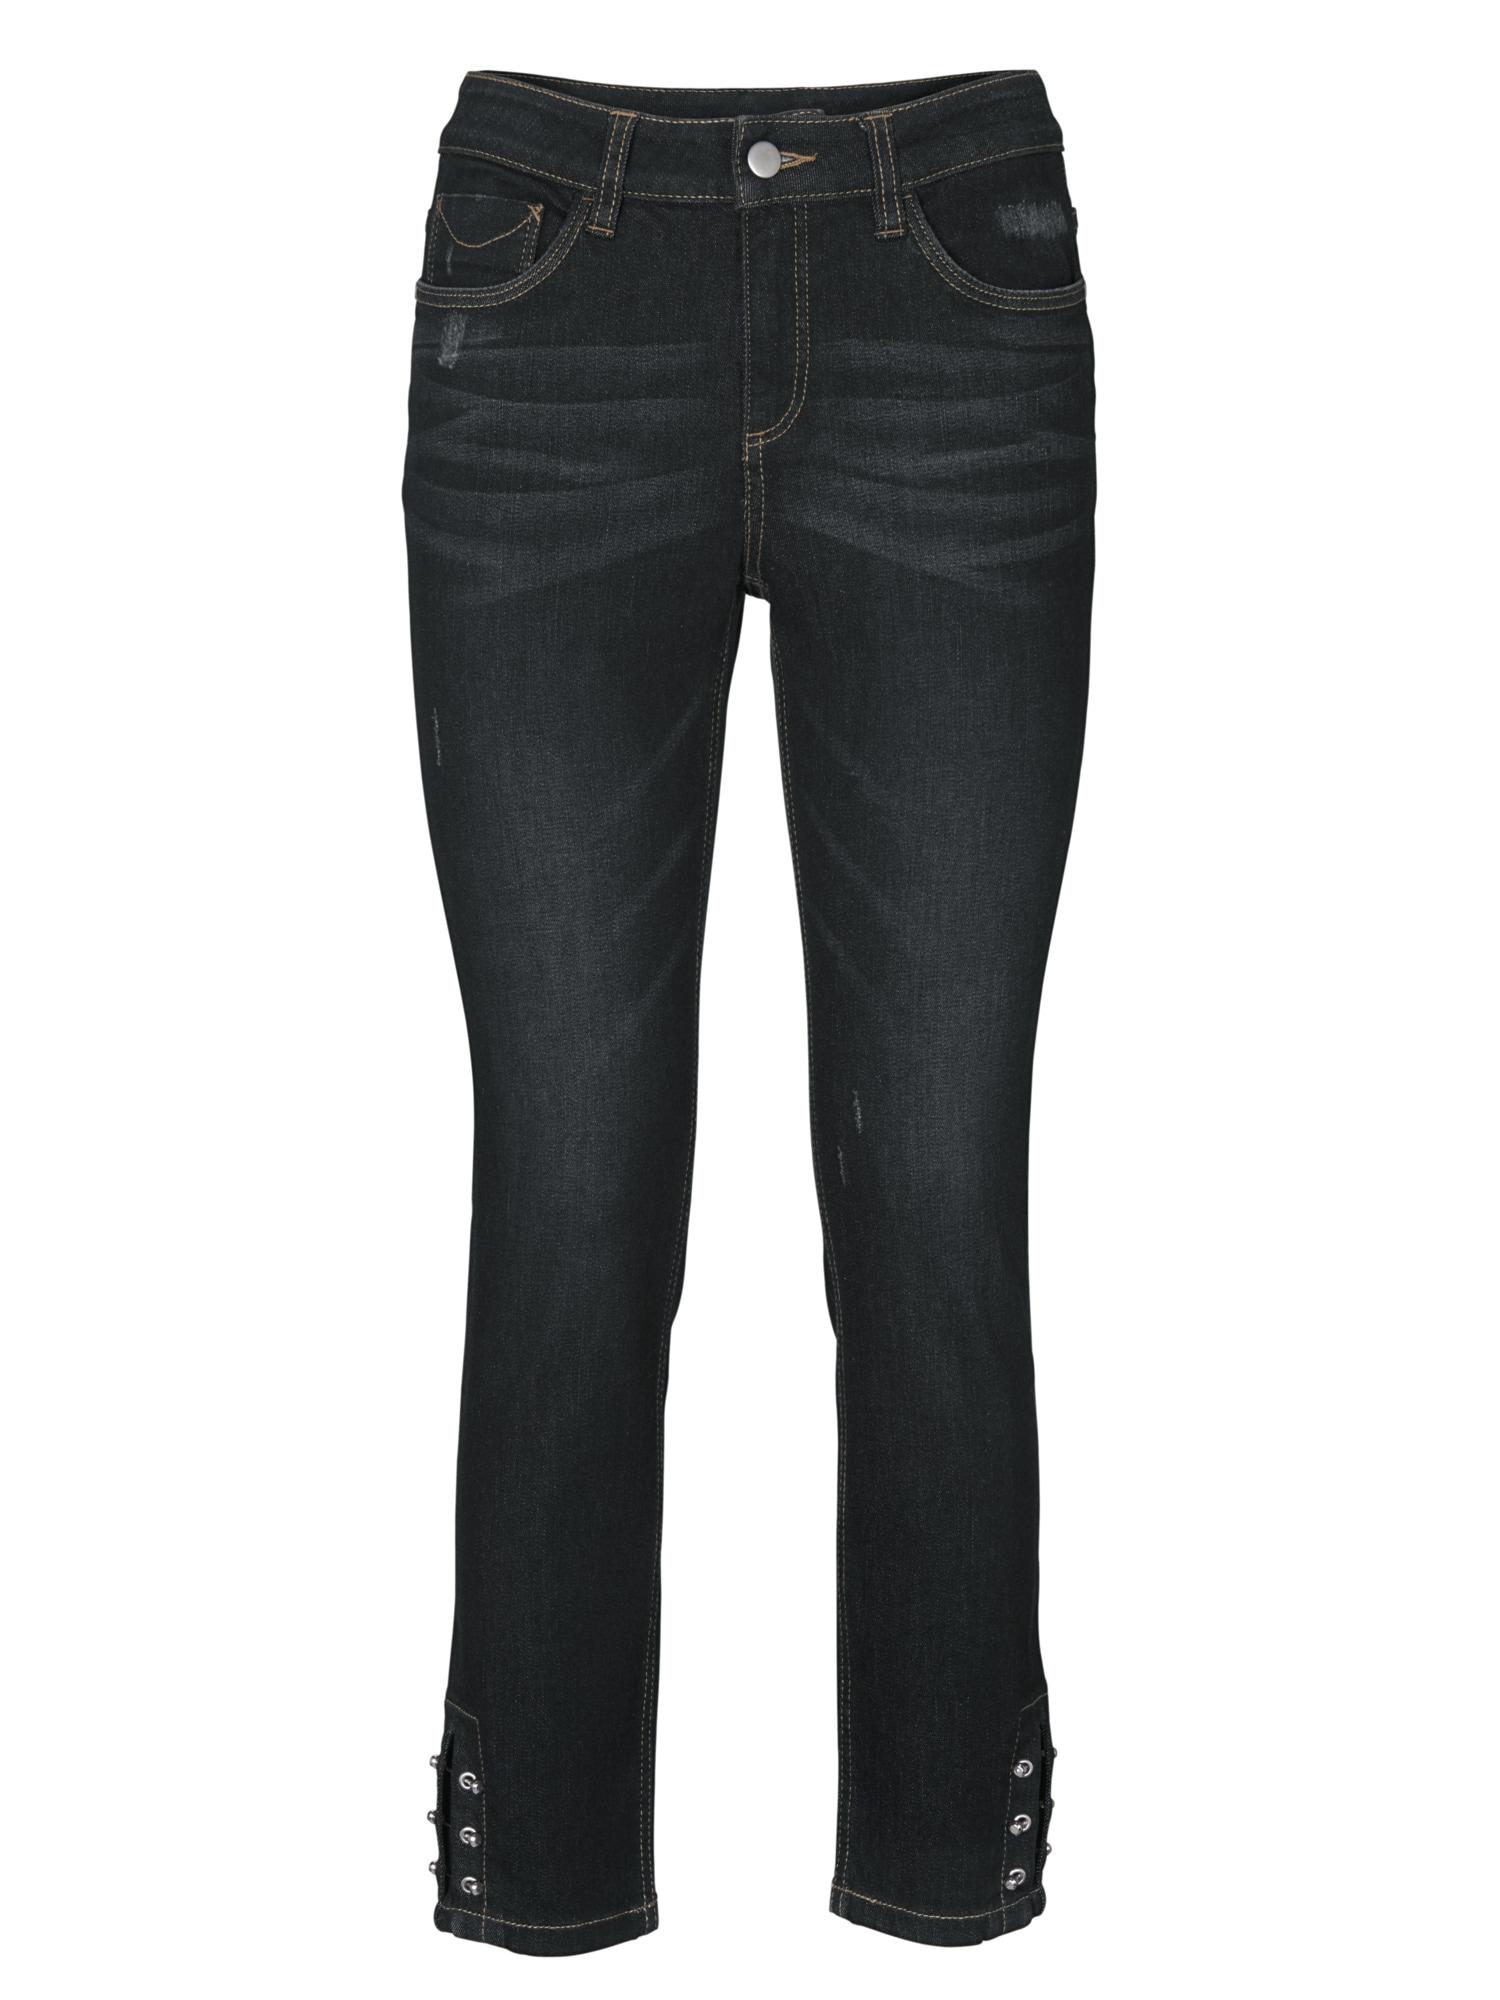 heine CASUAL Jeans im 5-Pocket-Style